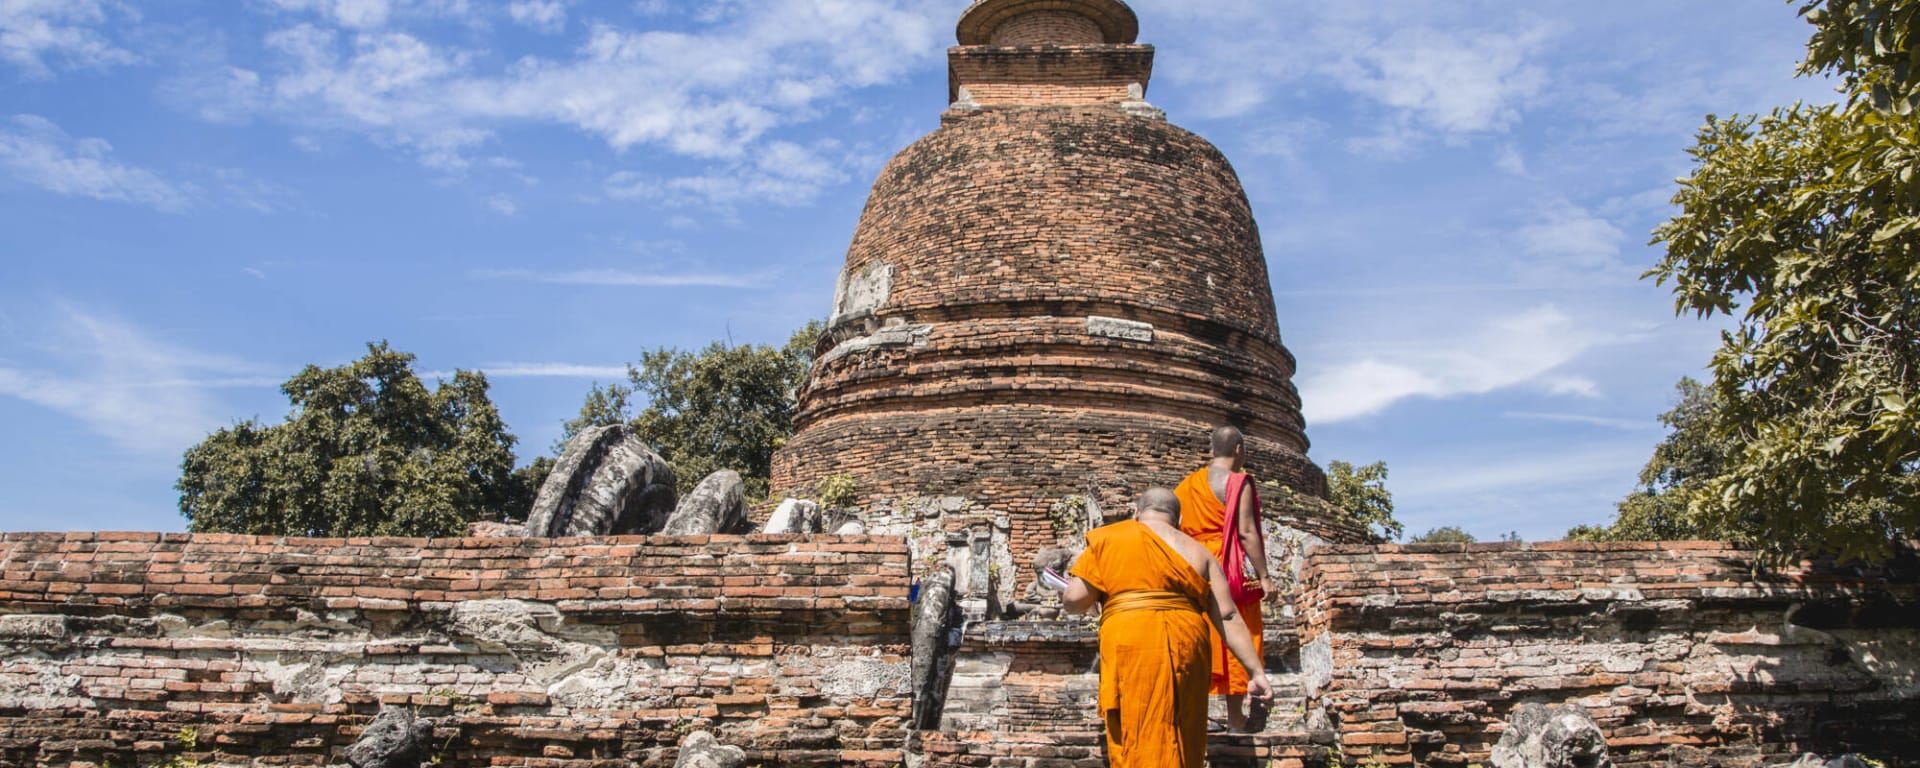 Ayutthaya & Mae Klong ab Bangkok: 1th-ayutthaya-monk-st-2016-firstyahoo